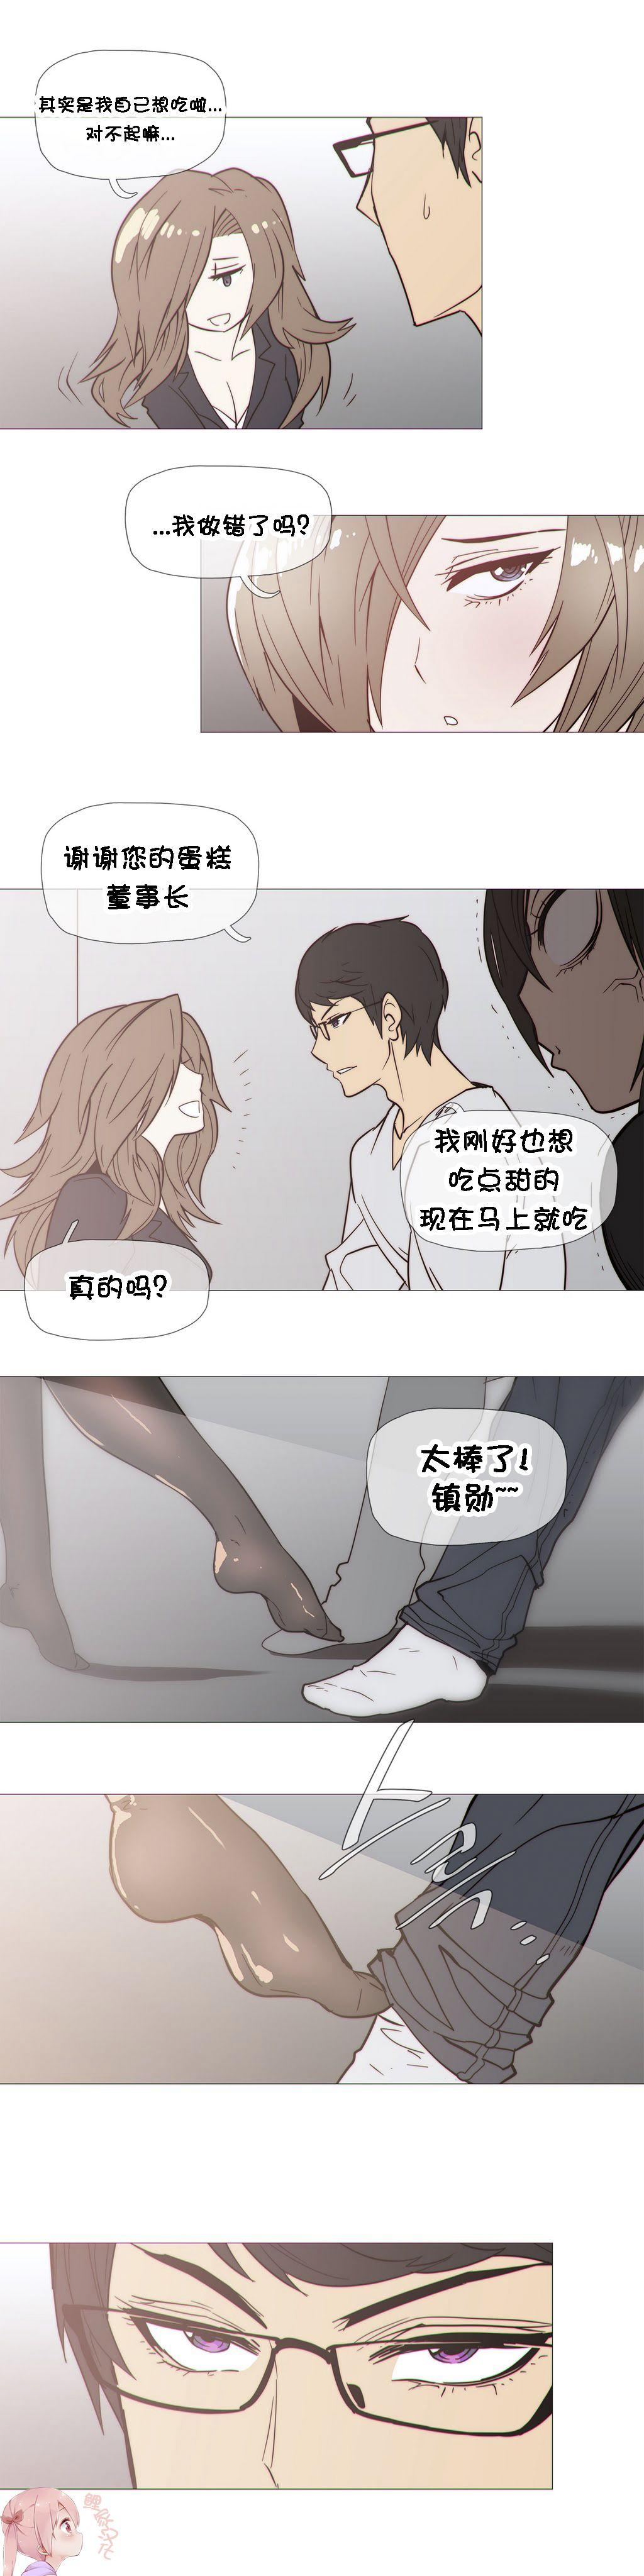 HouseHold Affairs 【卞赤鲤个人汉化】1~33话(持续更新中) 636